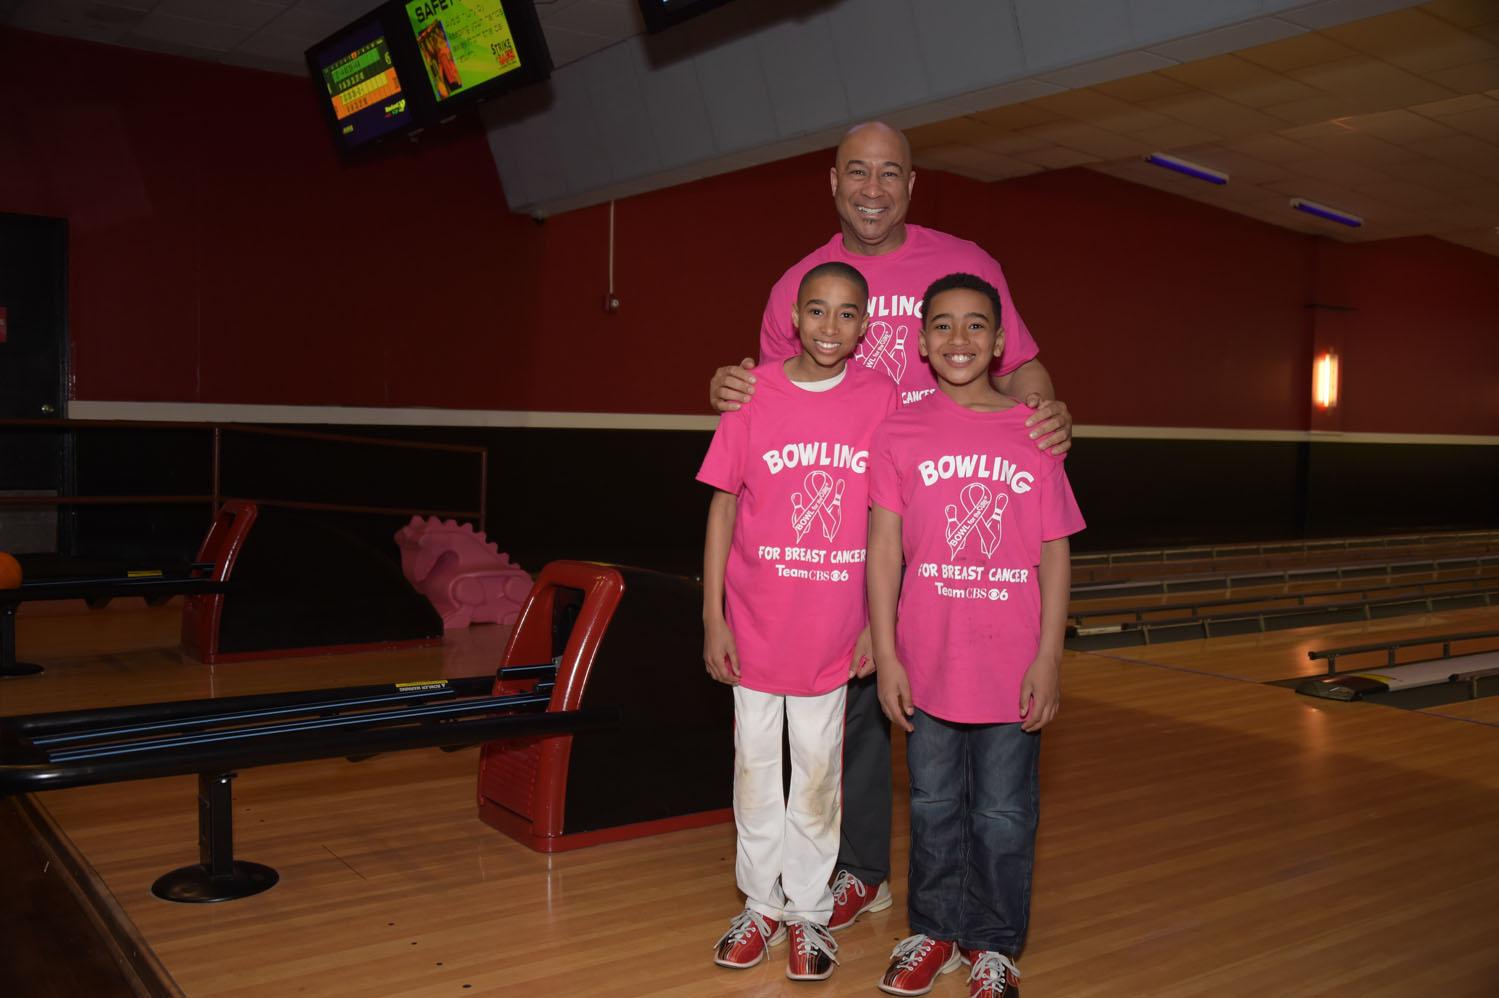 Bowling_20140108_1008.jpg